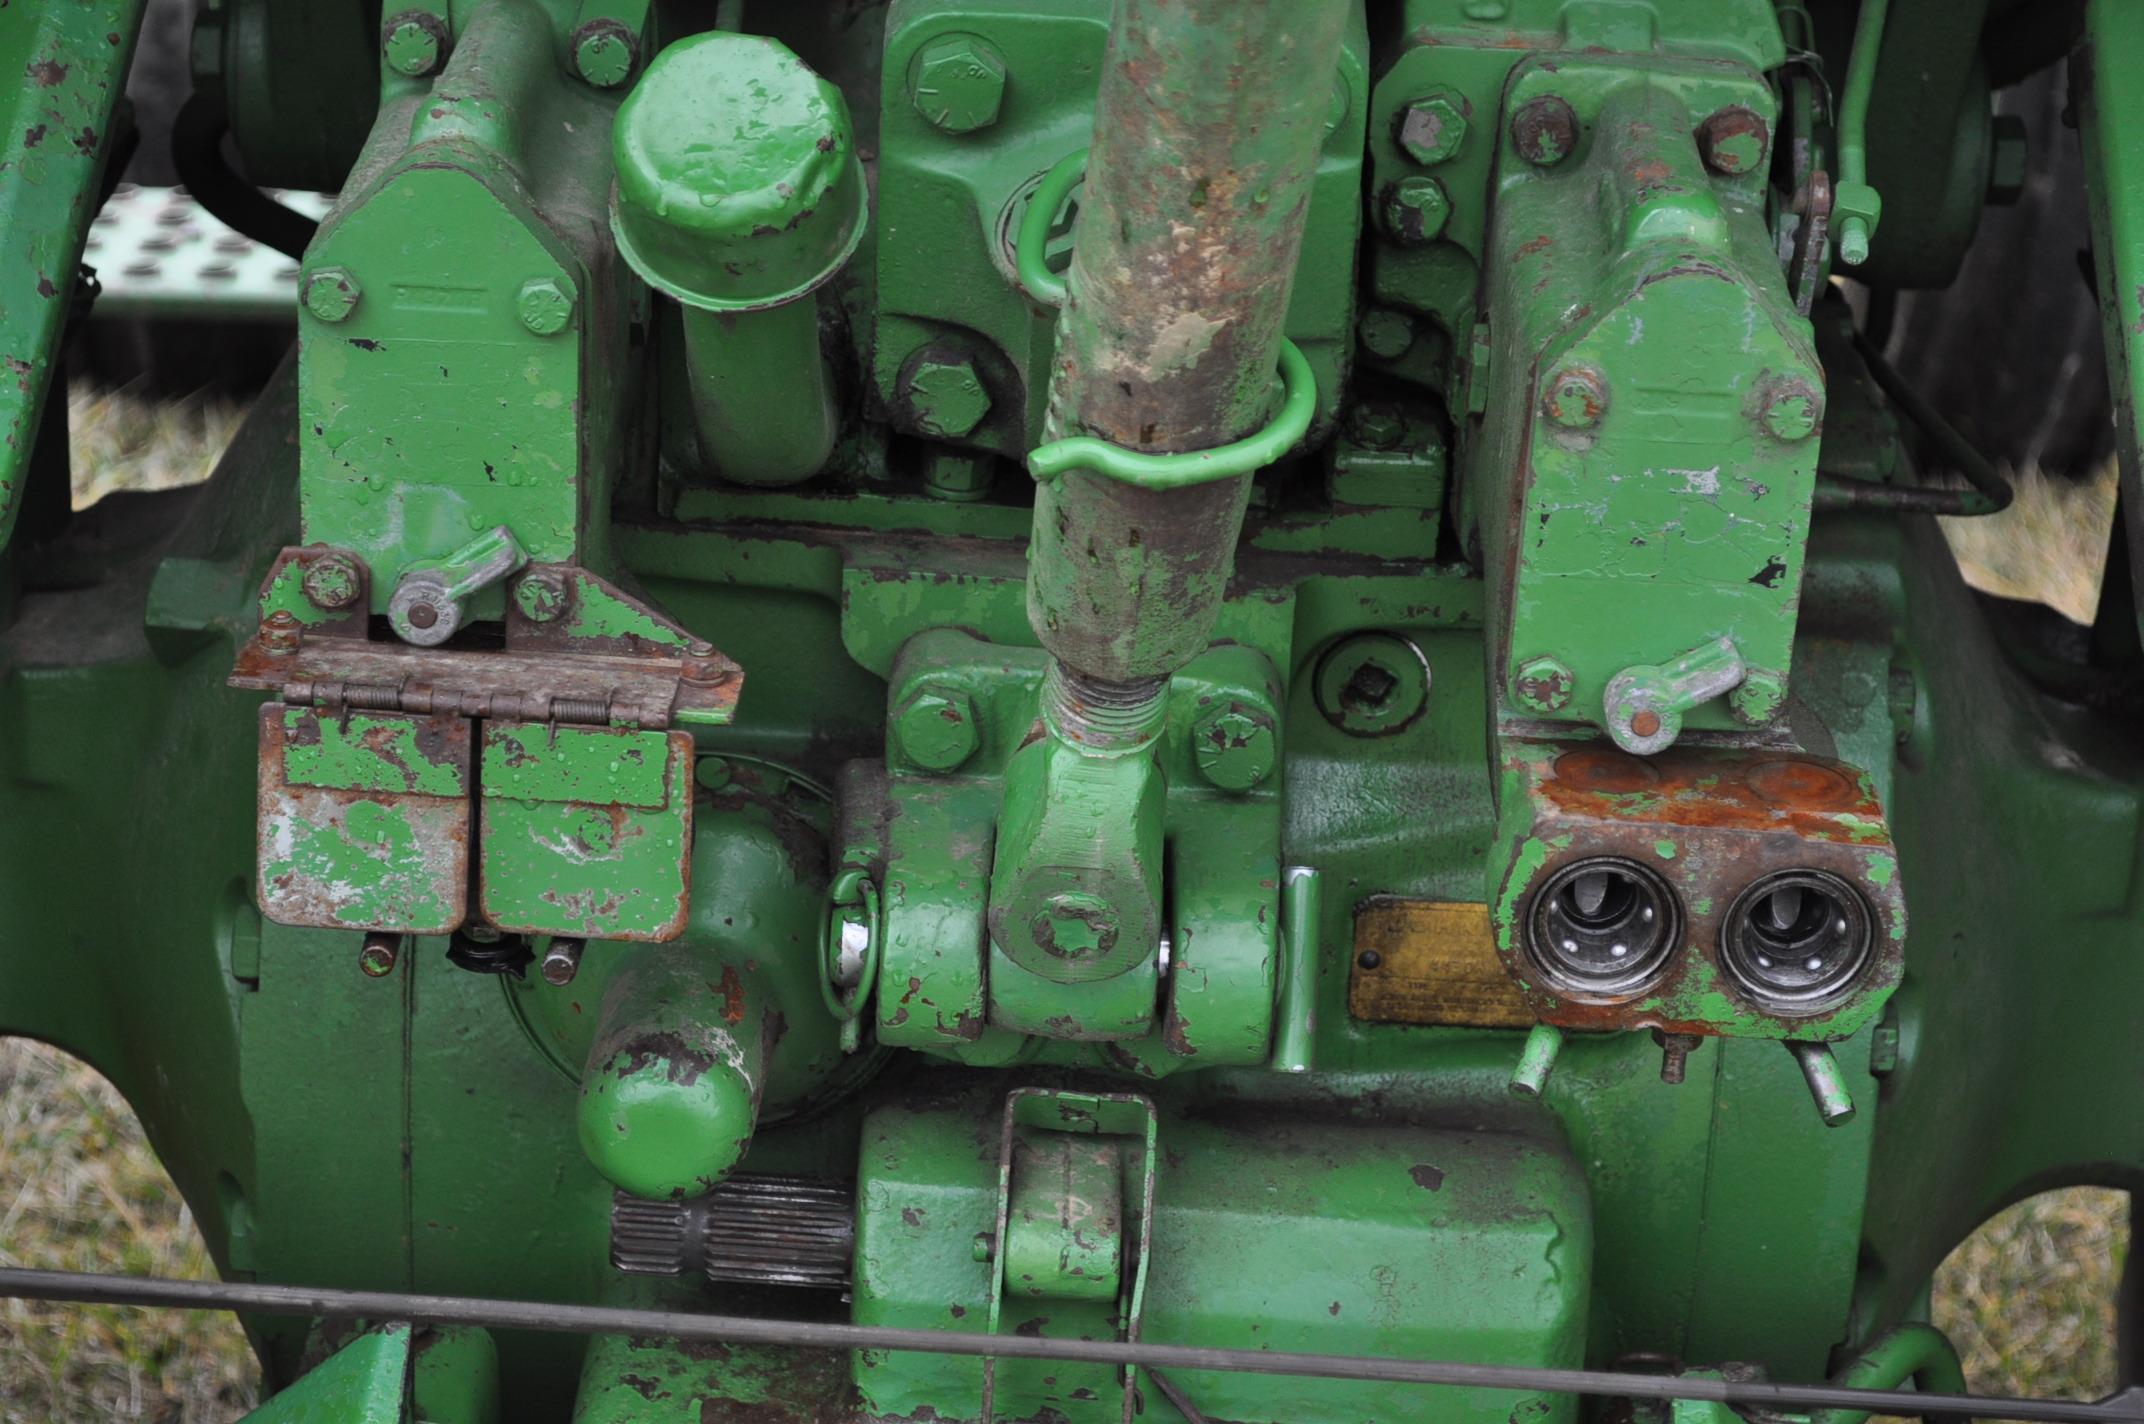 John Deere 4430 tractor, diesel, 18.4-34 hub duals, 10.00-16 front, CHA, Quad range, 2 hyd - Image 12 of 20